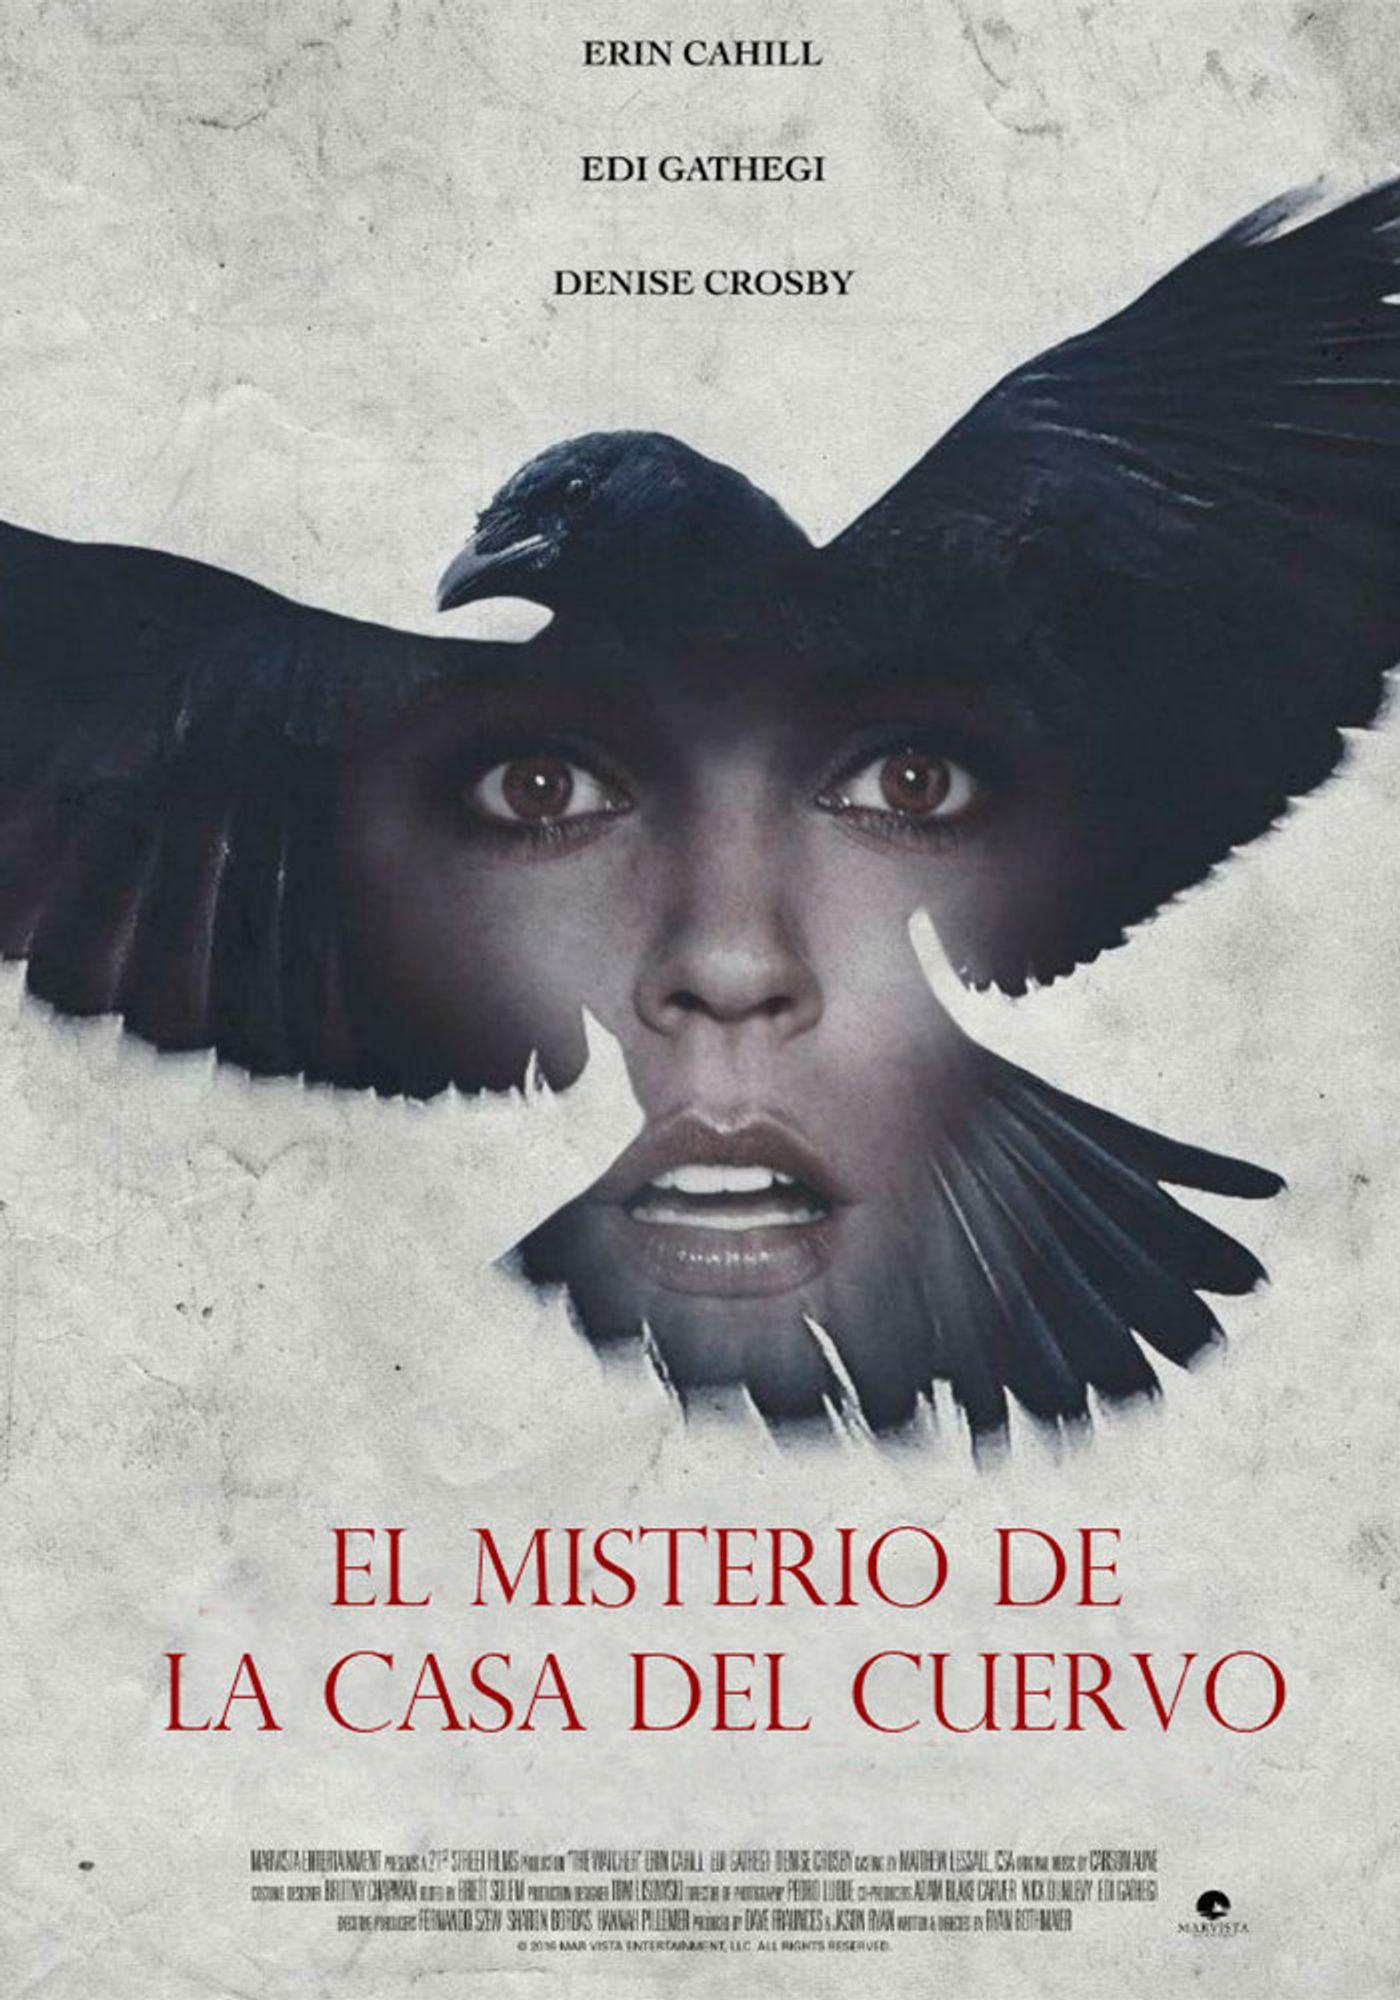 cee56e7zktxf_poster_elmisteriodelacasadelcuervo.jpg